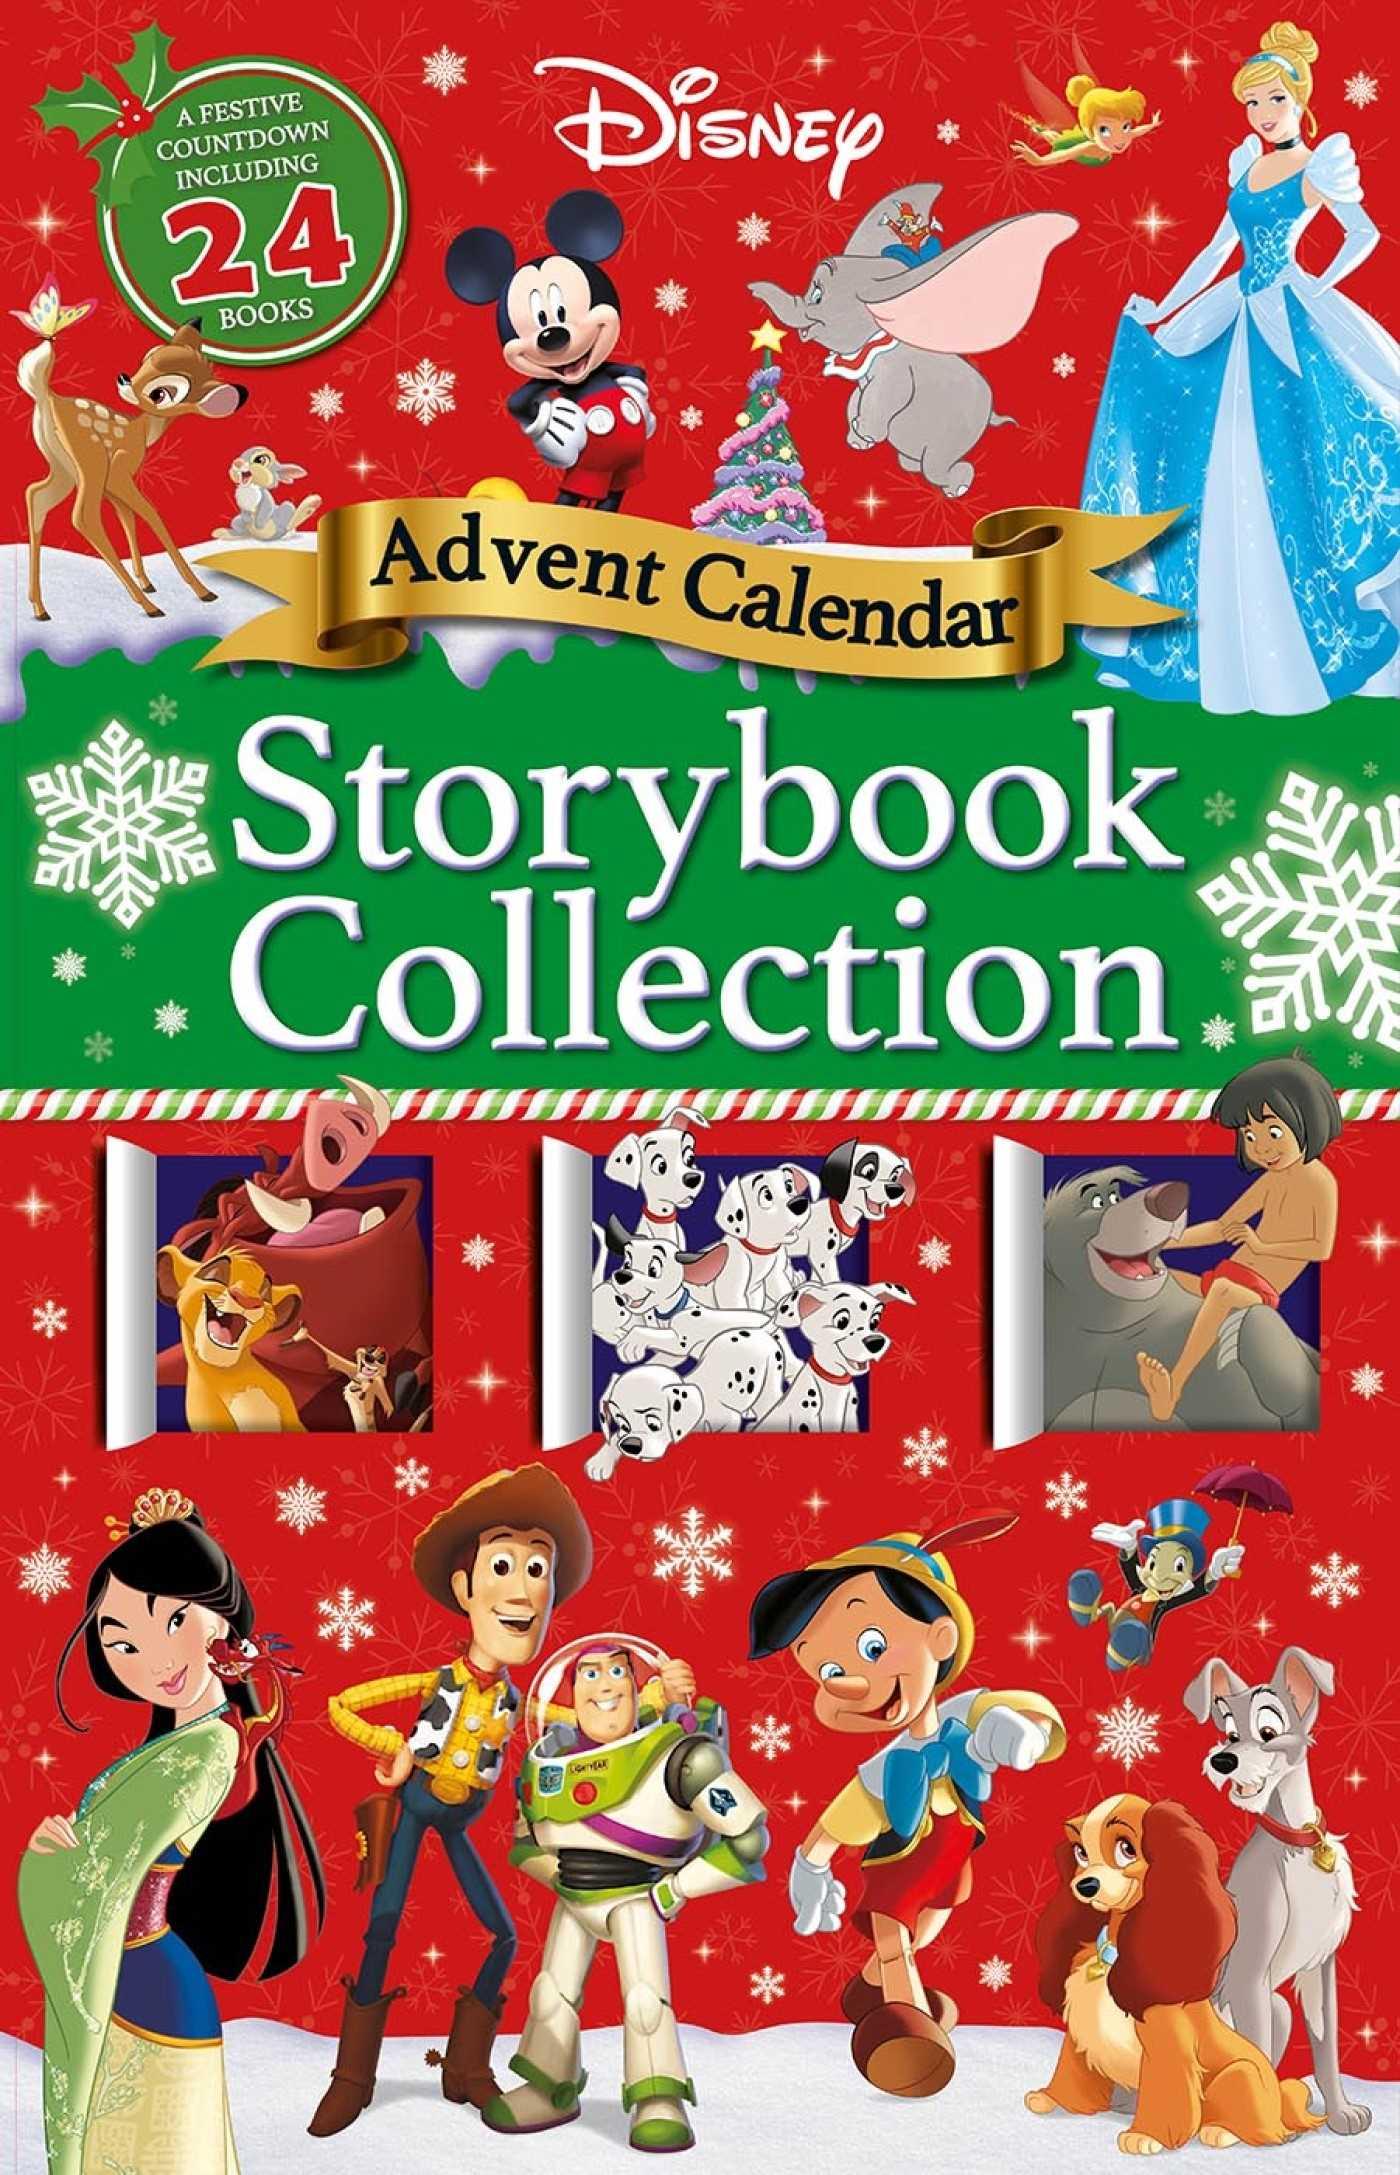 Disney storybook collection advent calendar 9781789053425 hr